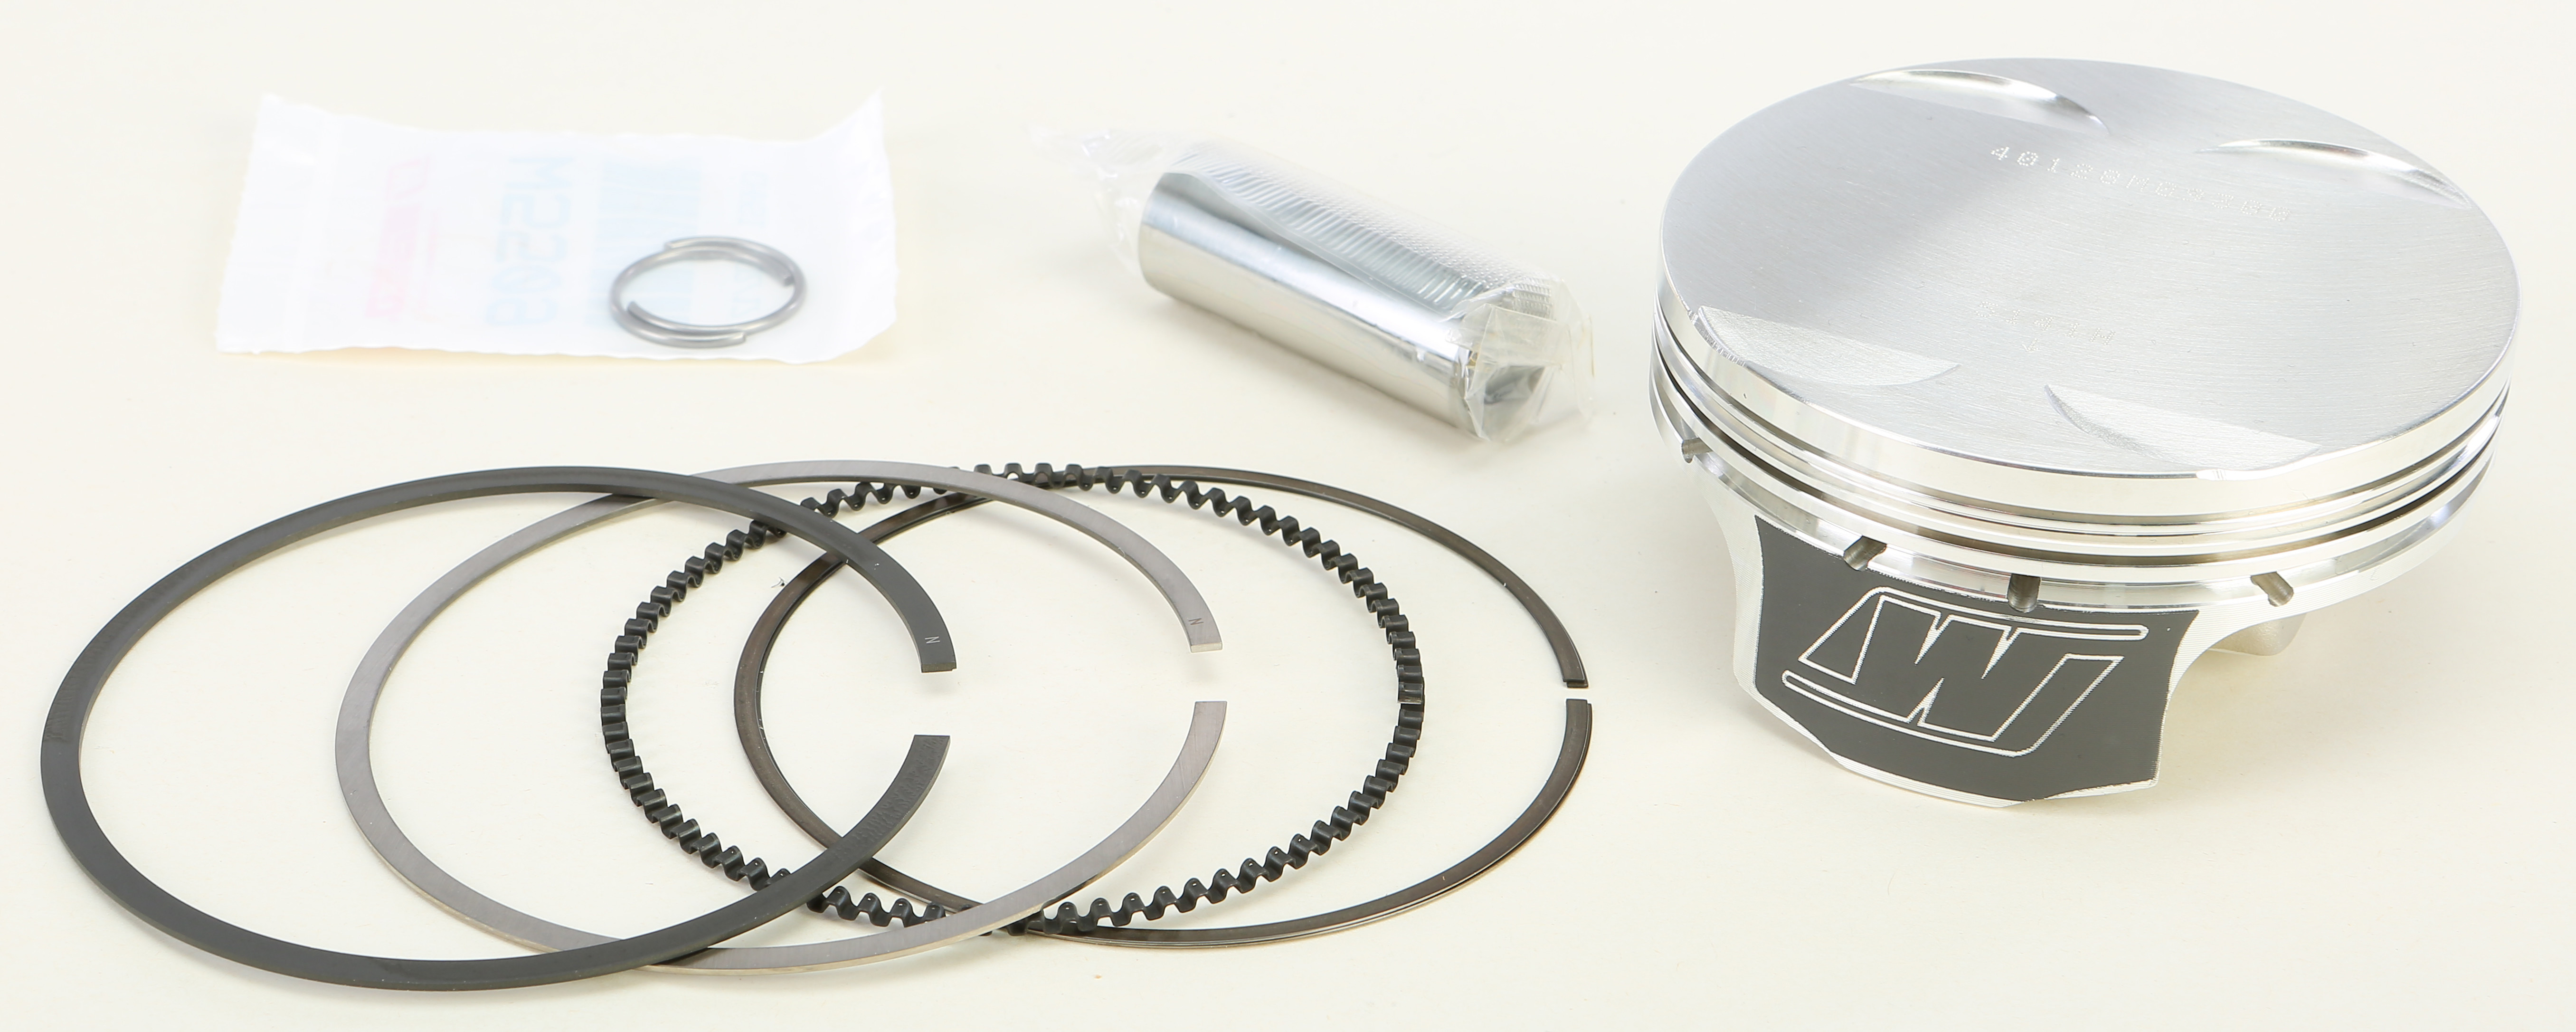 Wiseco PK1096 67.75 mm 2-Stroke ATV Piston Kit with Top-End Gasket Kit